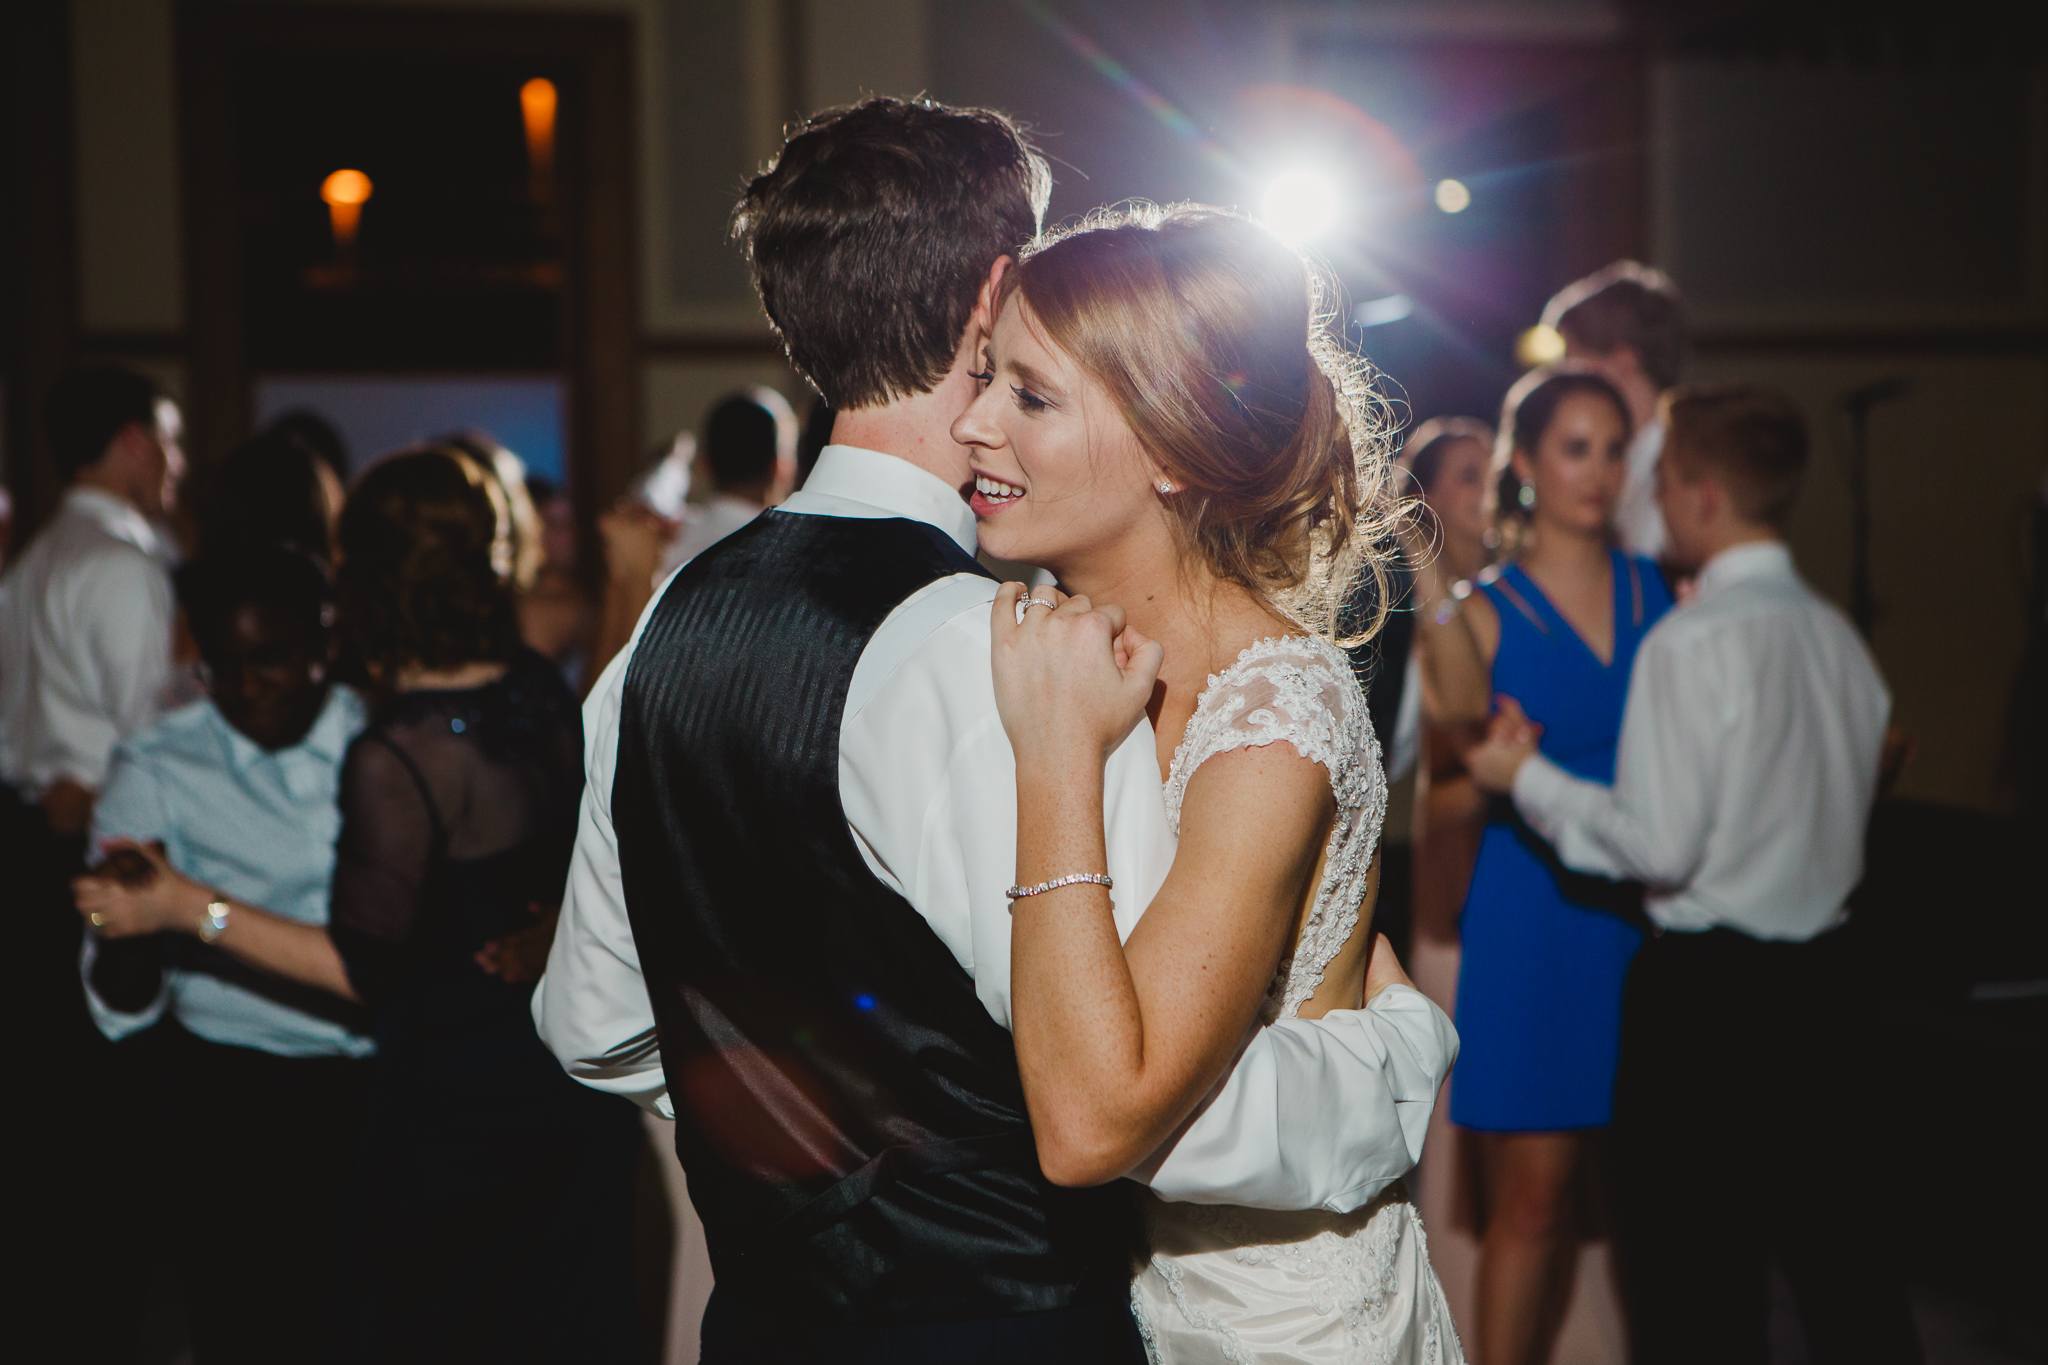 Michael and Kelly - the ashton depot - wedding DFW - wedding photographer- elizalde photography (144 of 150).jpg